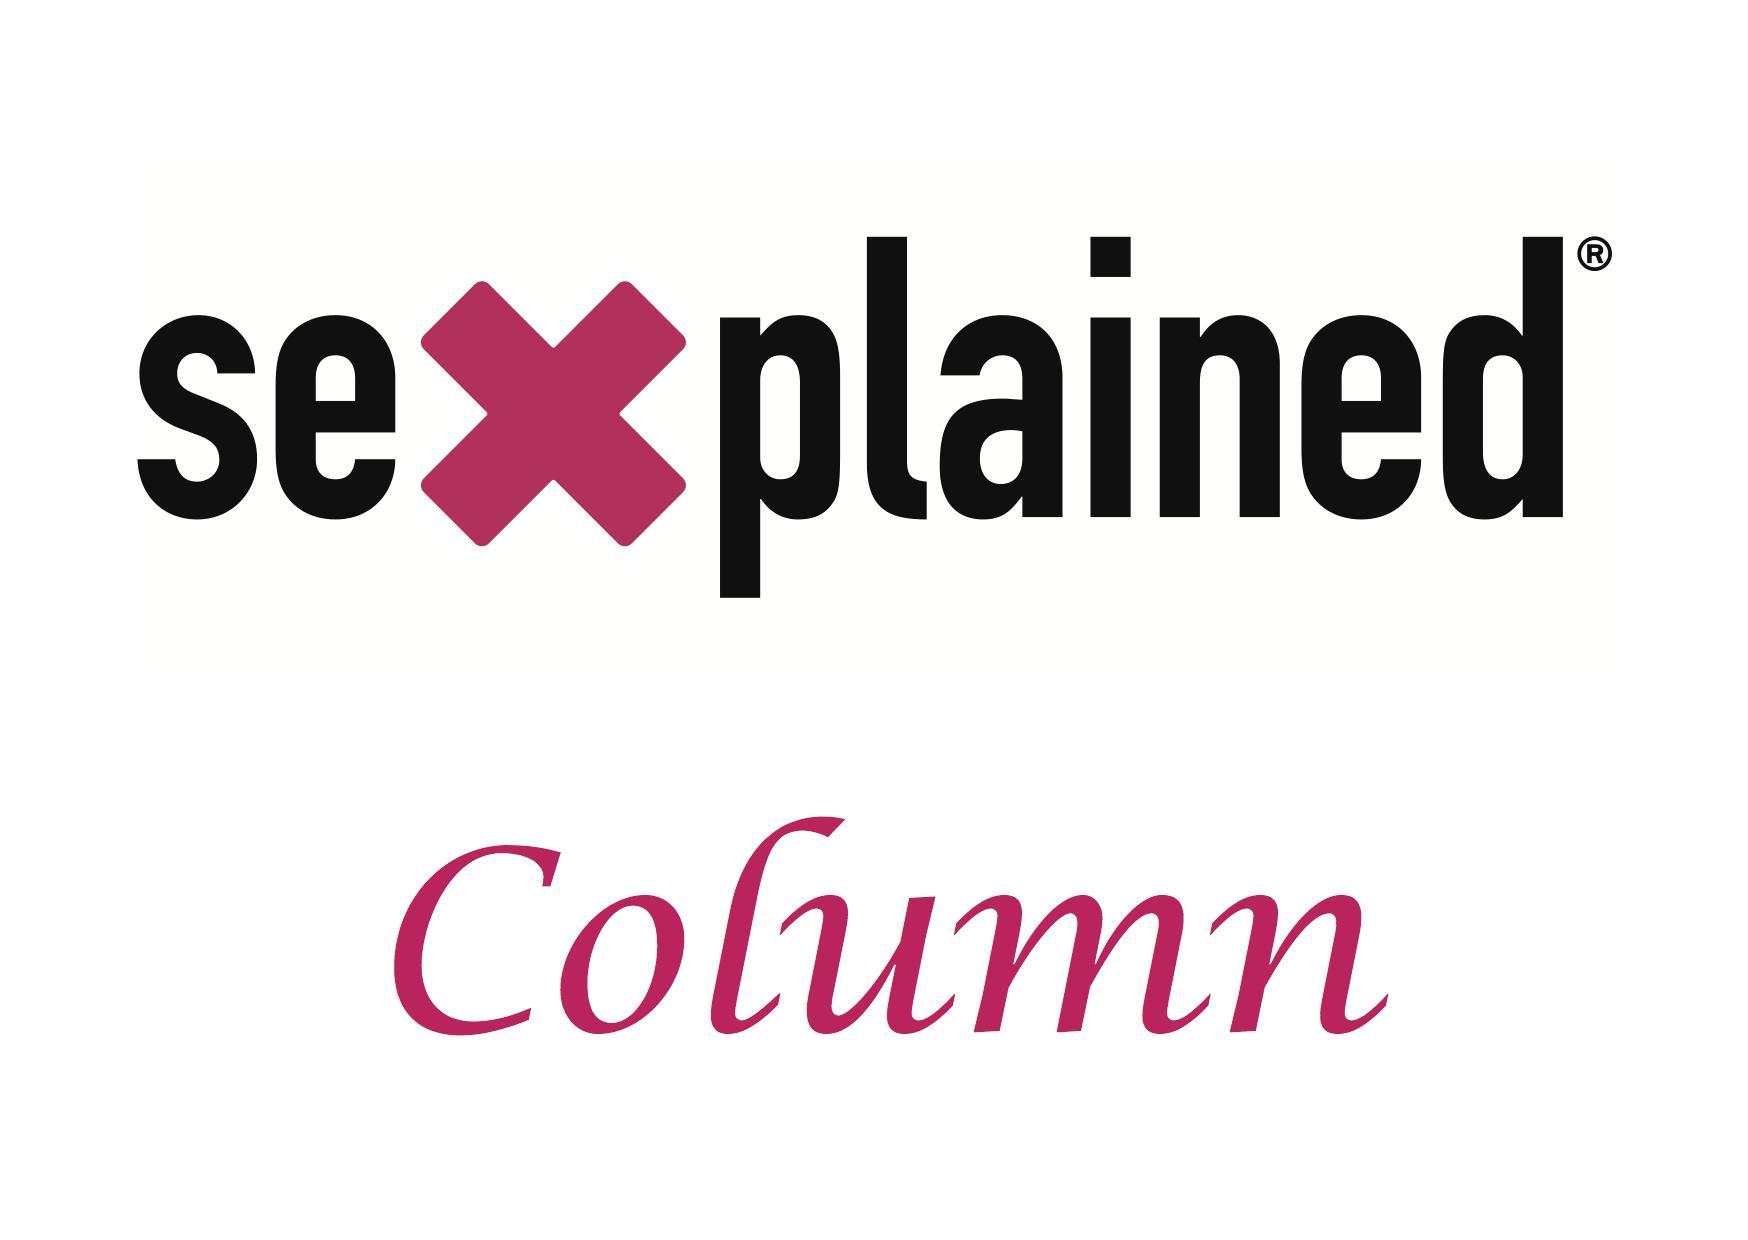 Sexplained Column